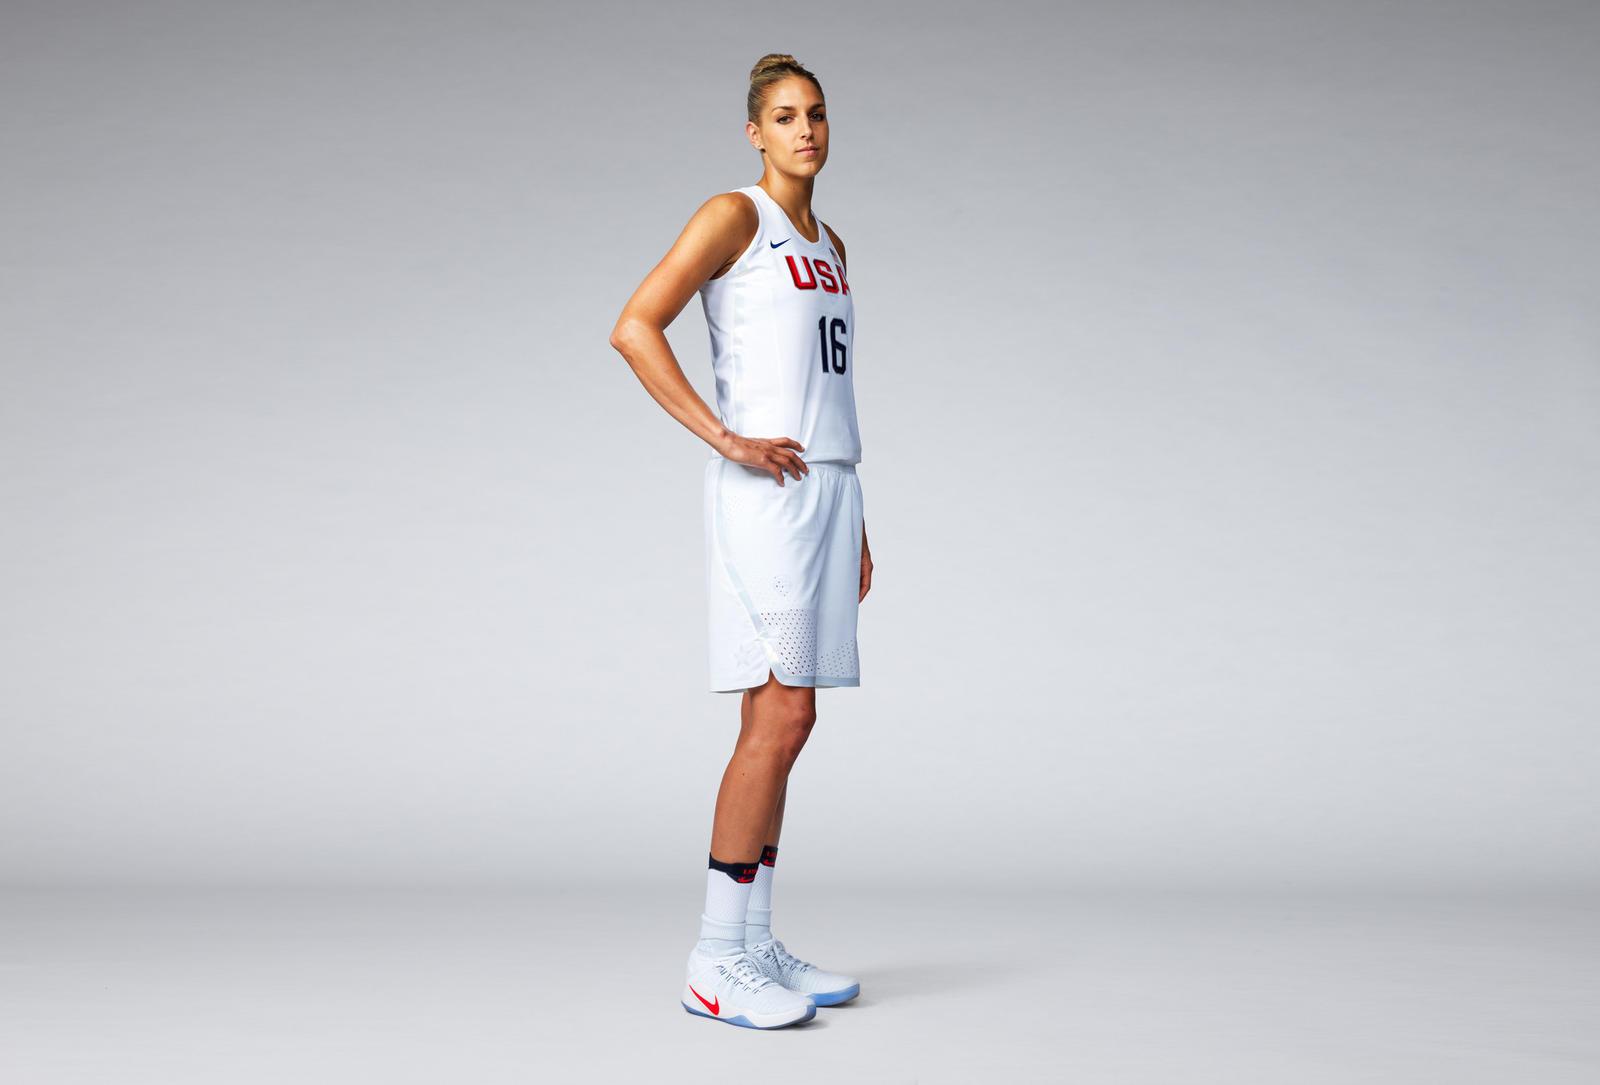 d6a3b1742 nike basketball uniforms 2016